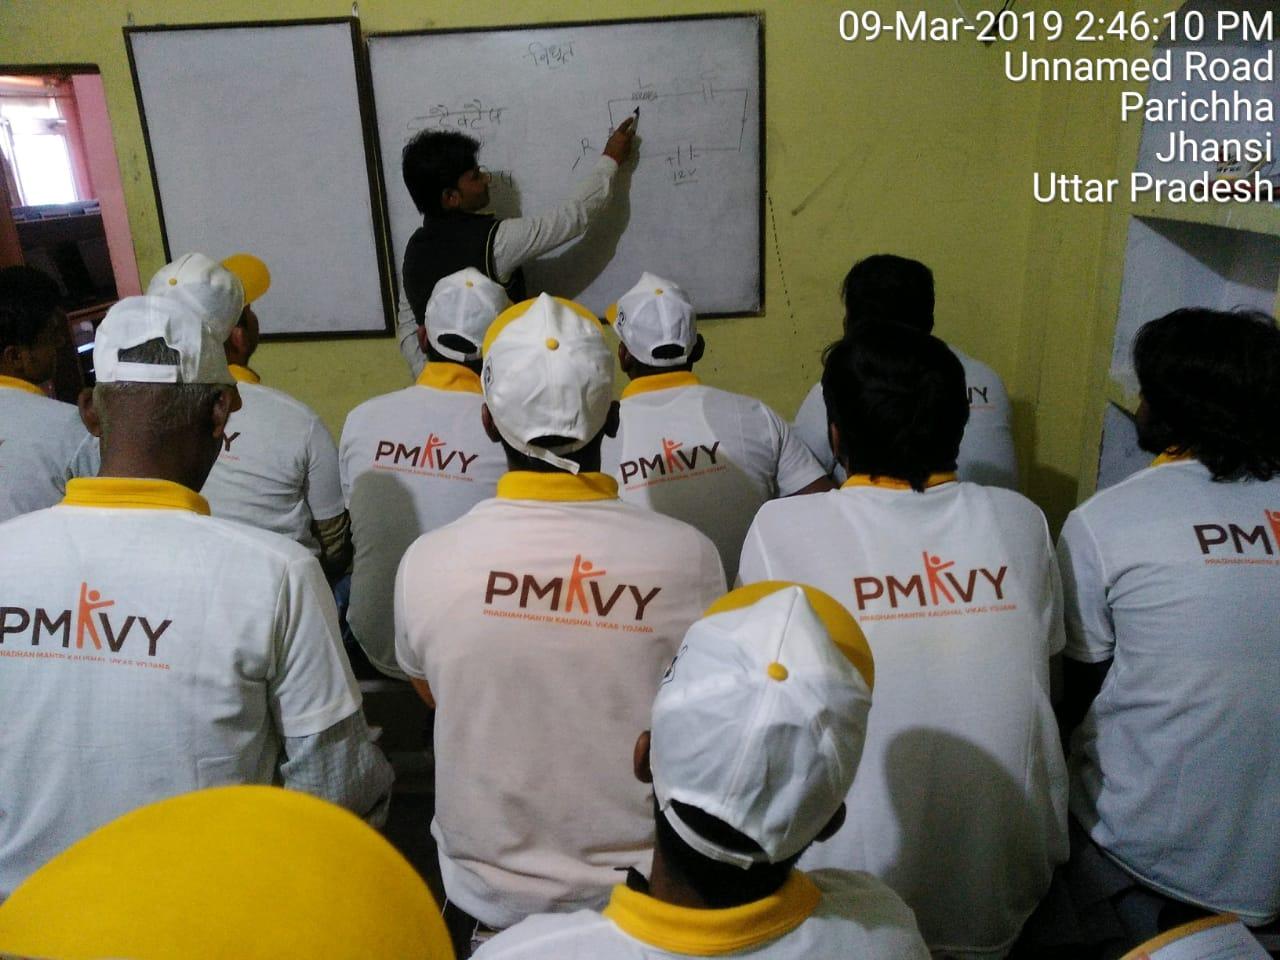 Saubhagya training program by Sona Yukti at Jhansi